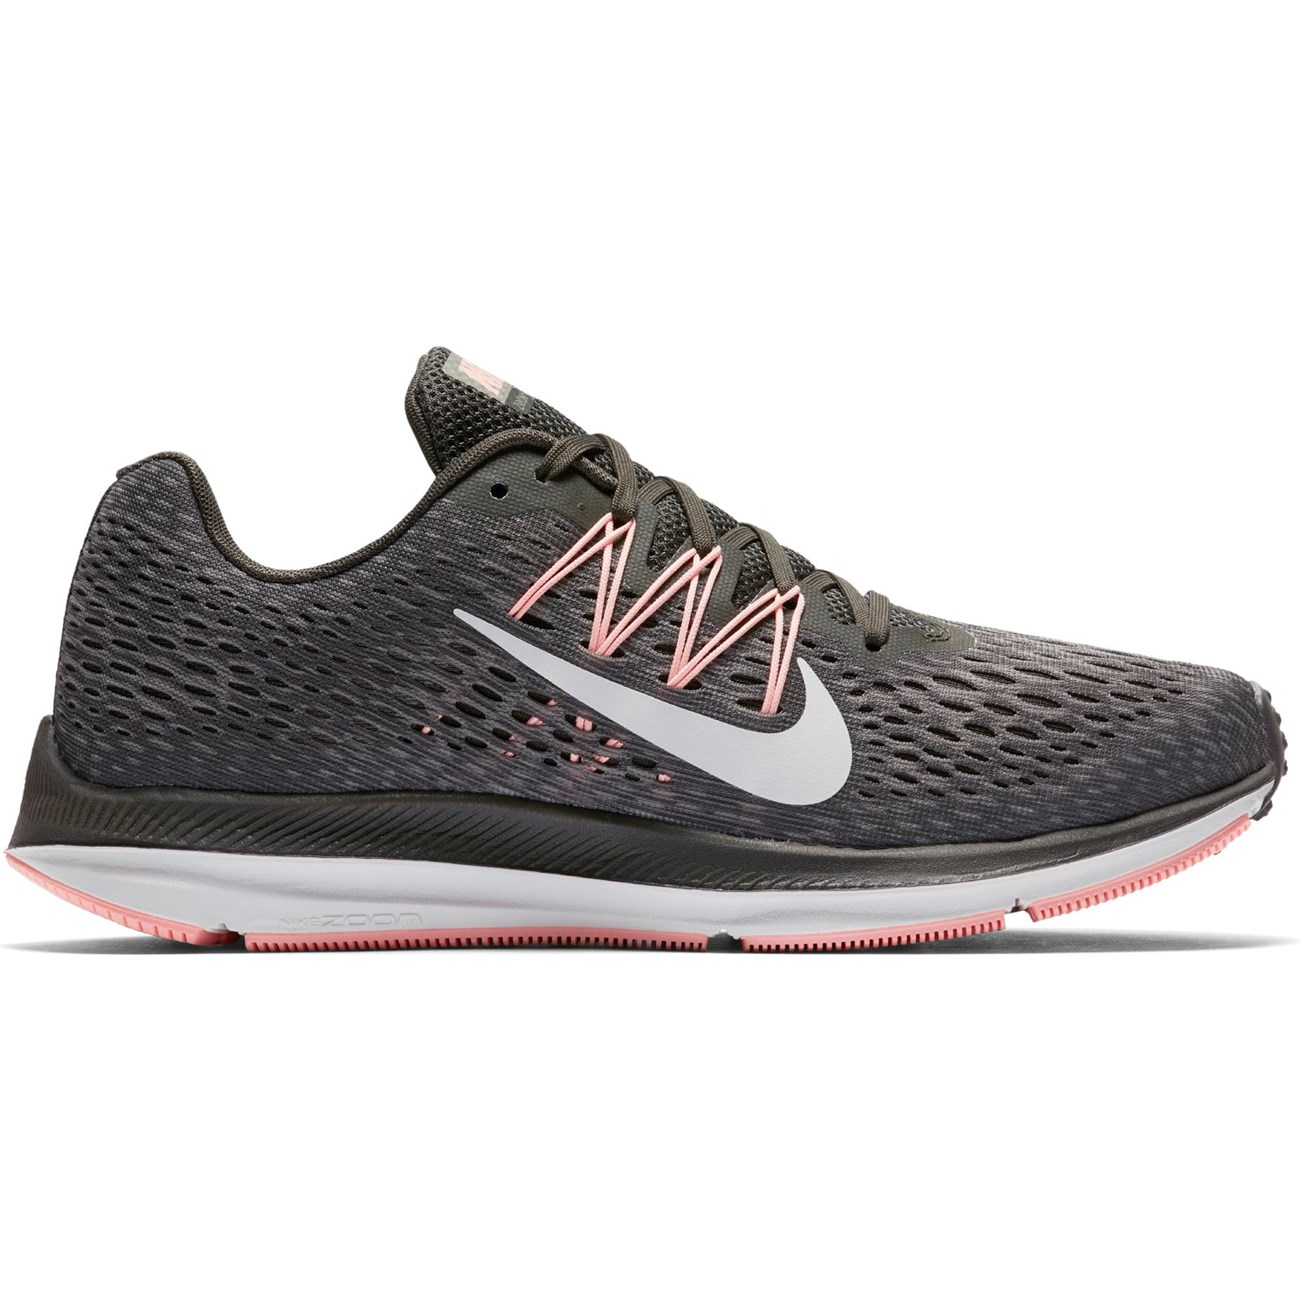 525bc2825a5 NIKE ZOOM WINFLO 5 W < Παπούτσια για Τρέξιμο   INTERSPORT